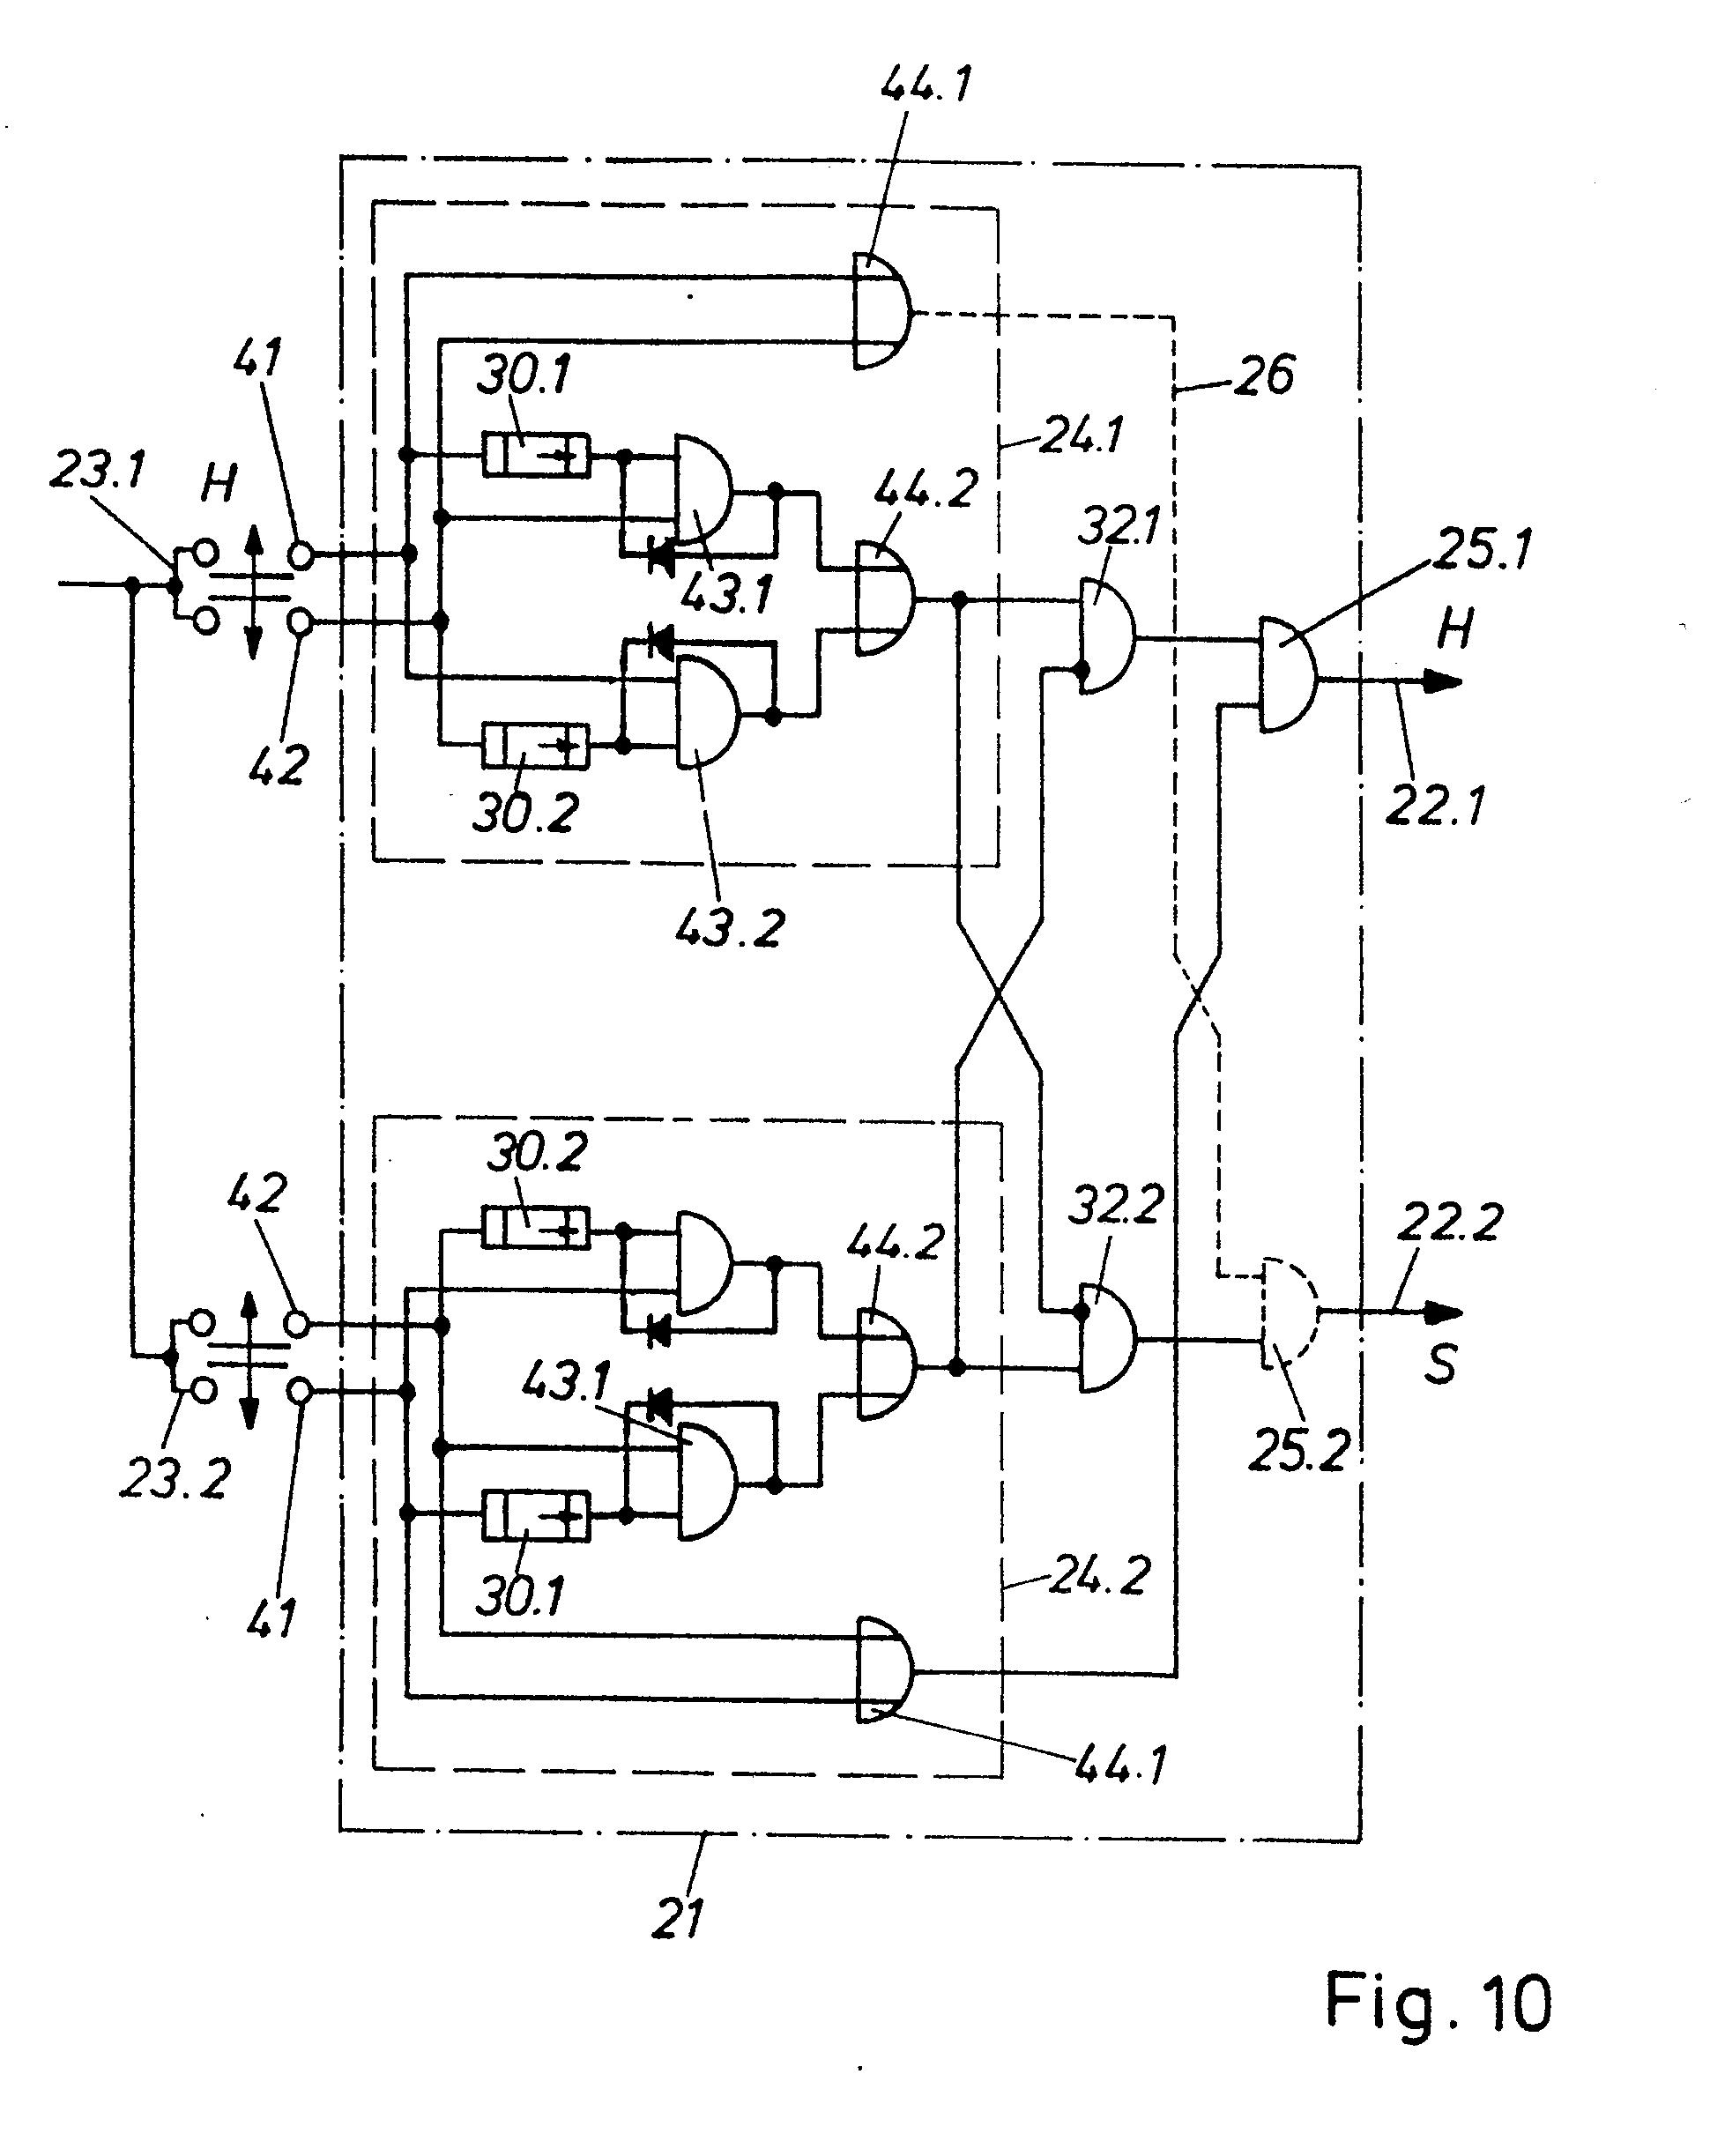 patente ep0080190a1 - hubladeb u00fchne